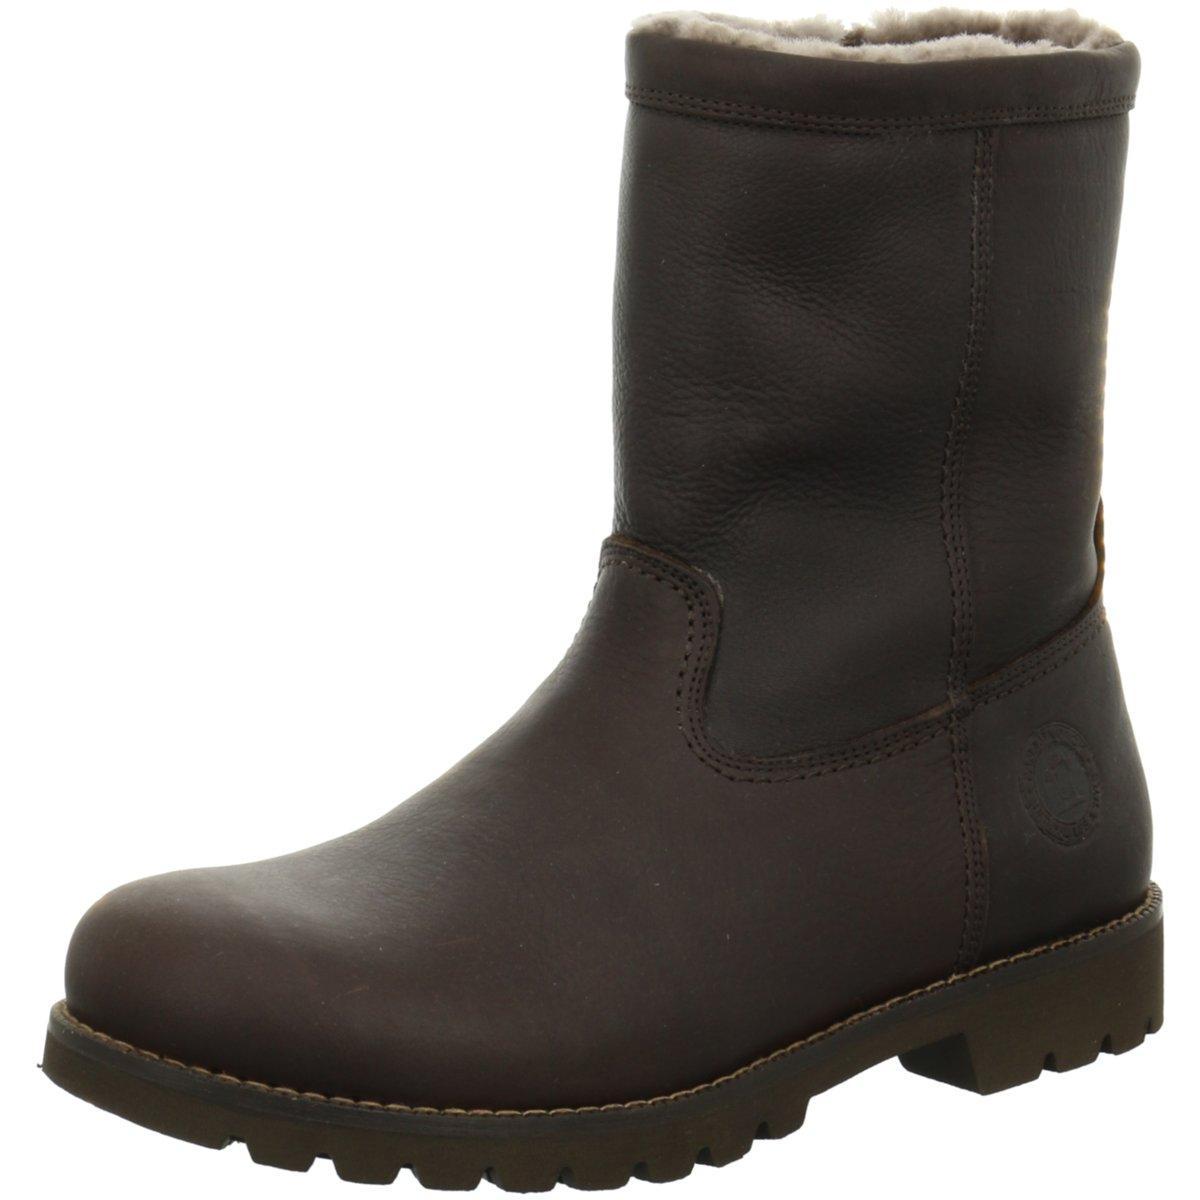 Details zu Tamaris Sneaker Soya 1 1 25216 27 234 grau